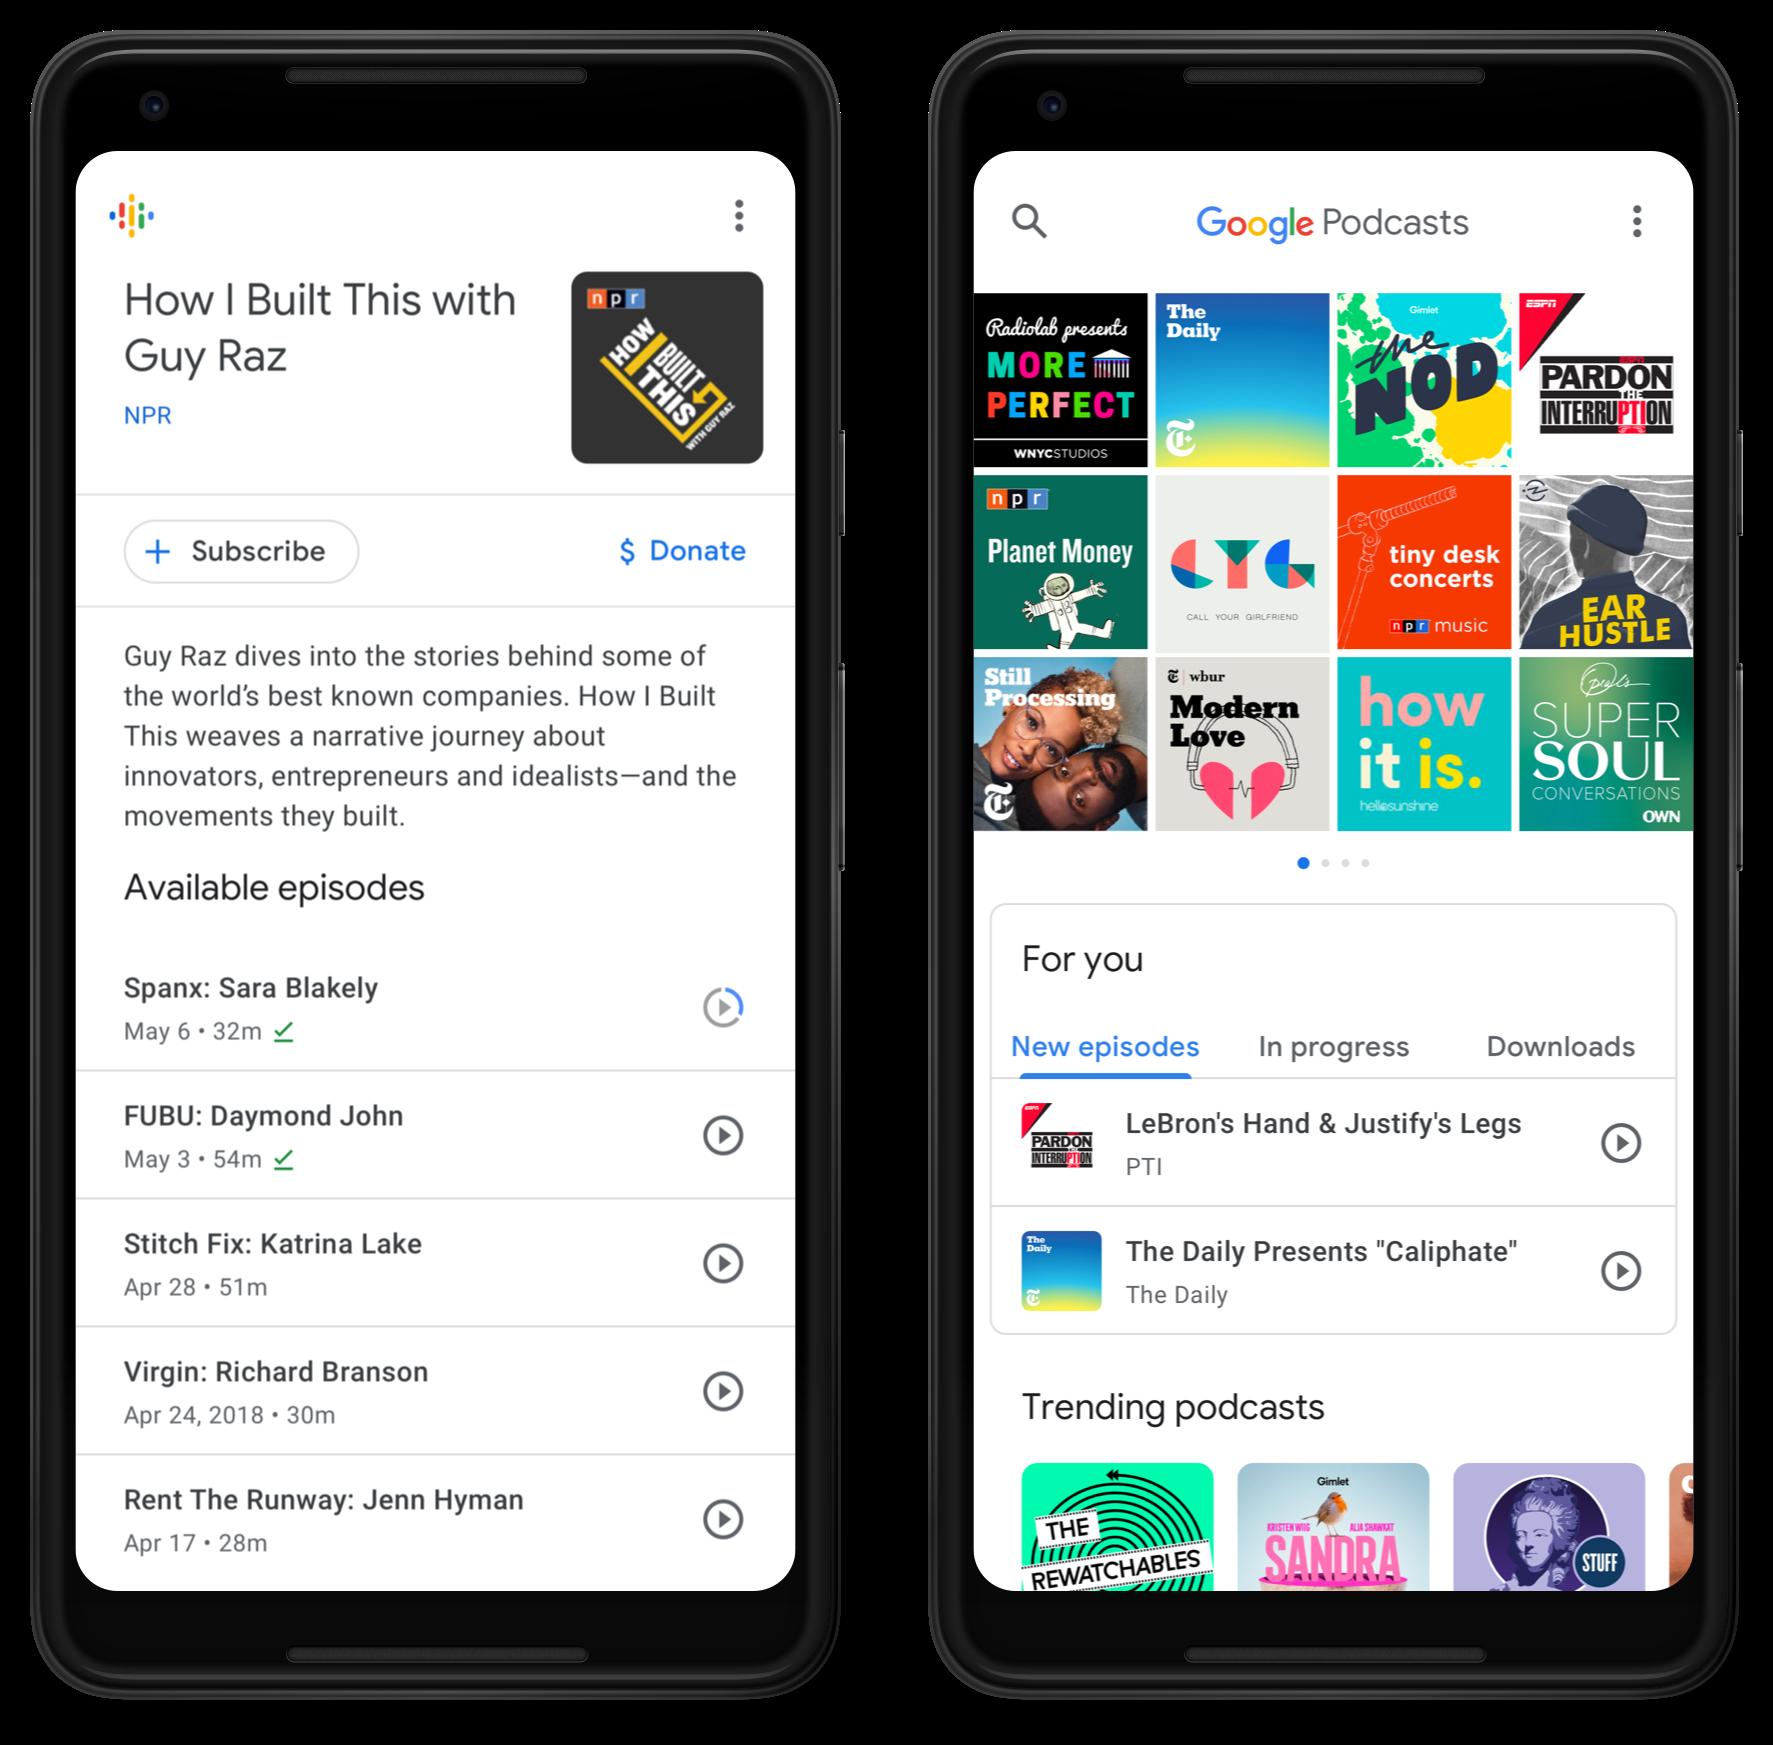 L'app Google Podcasts per Android